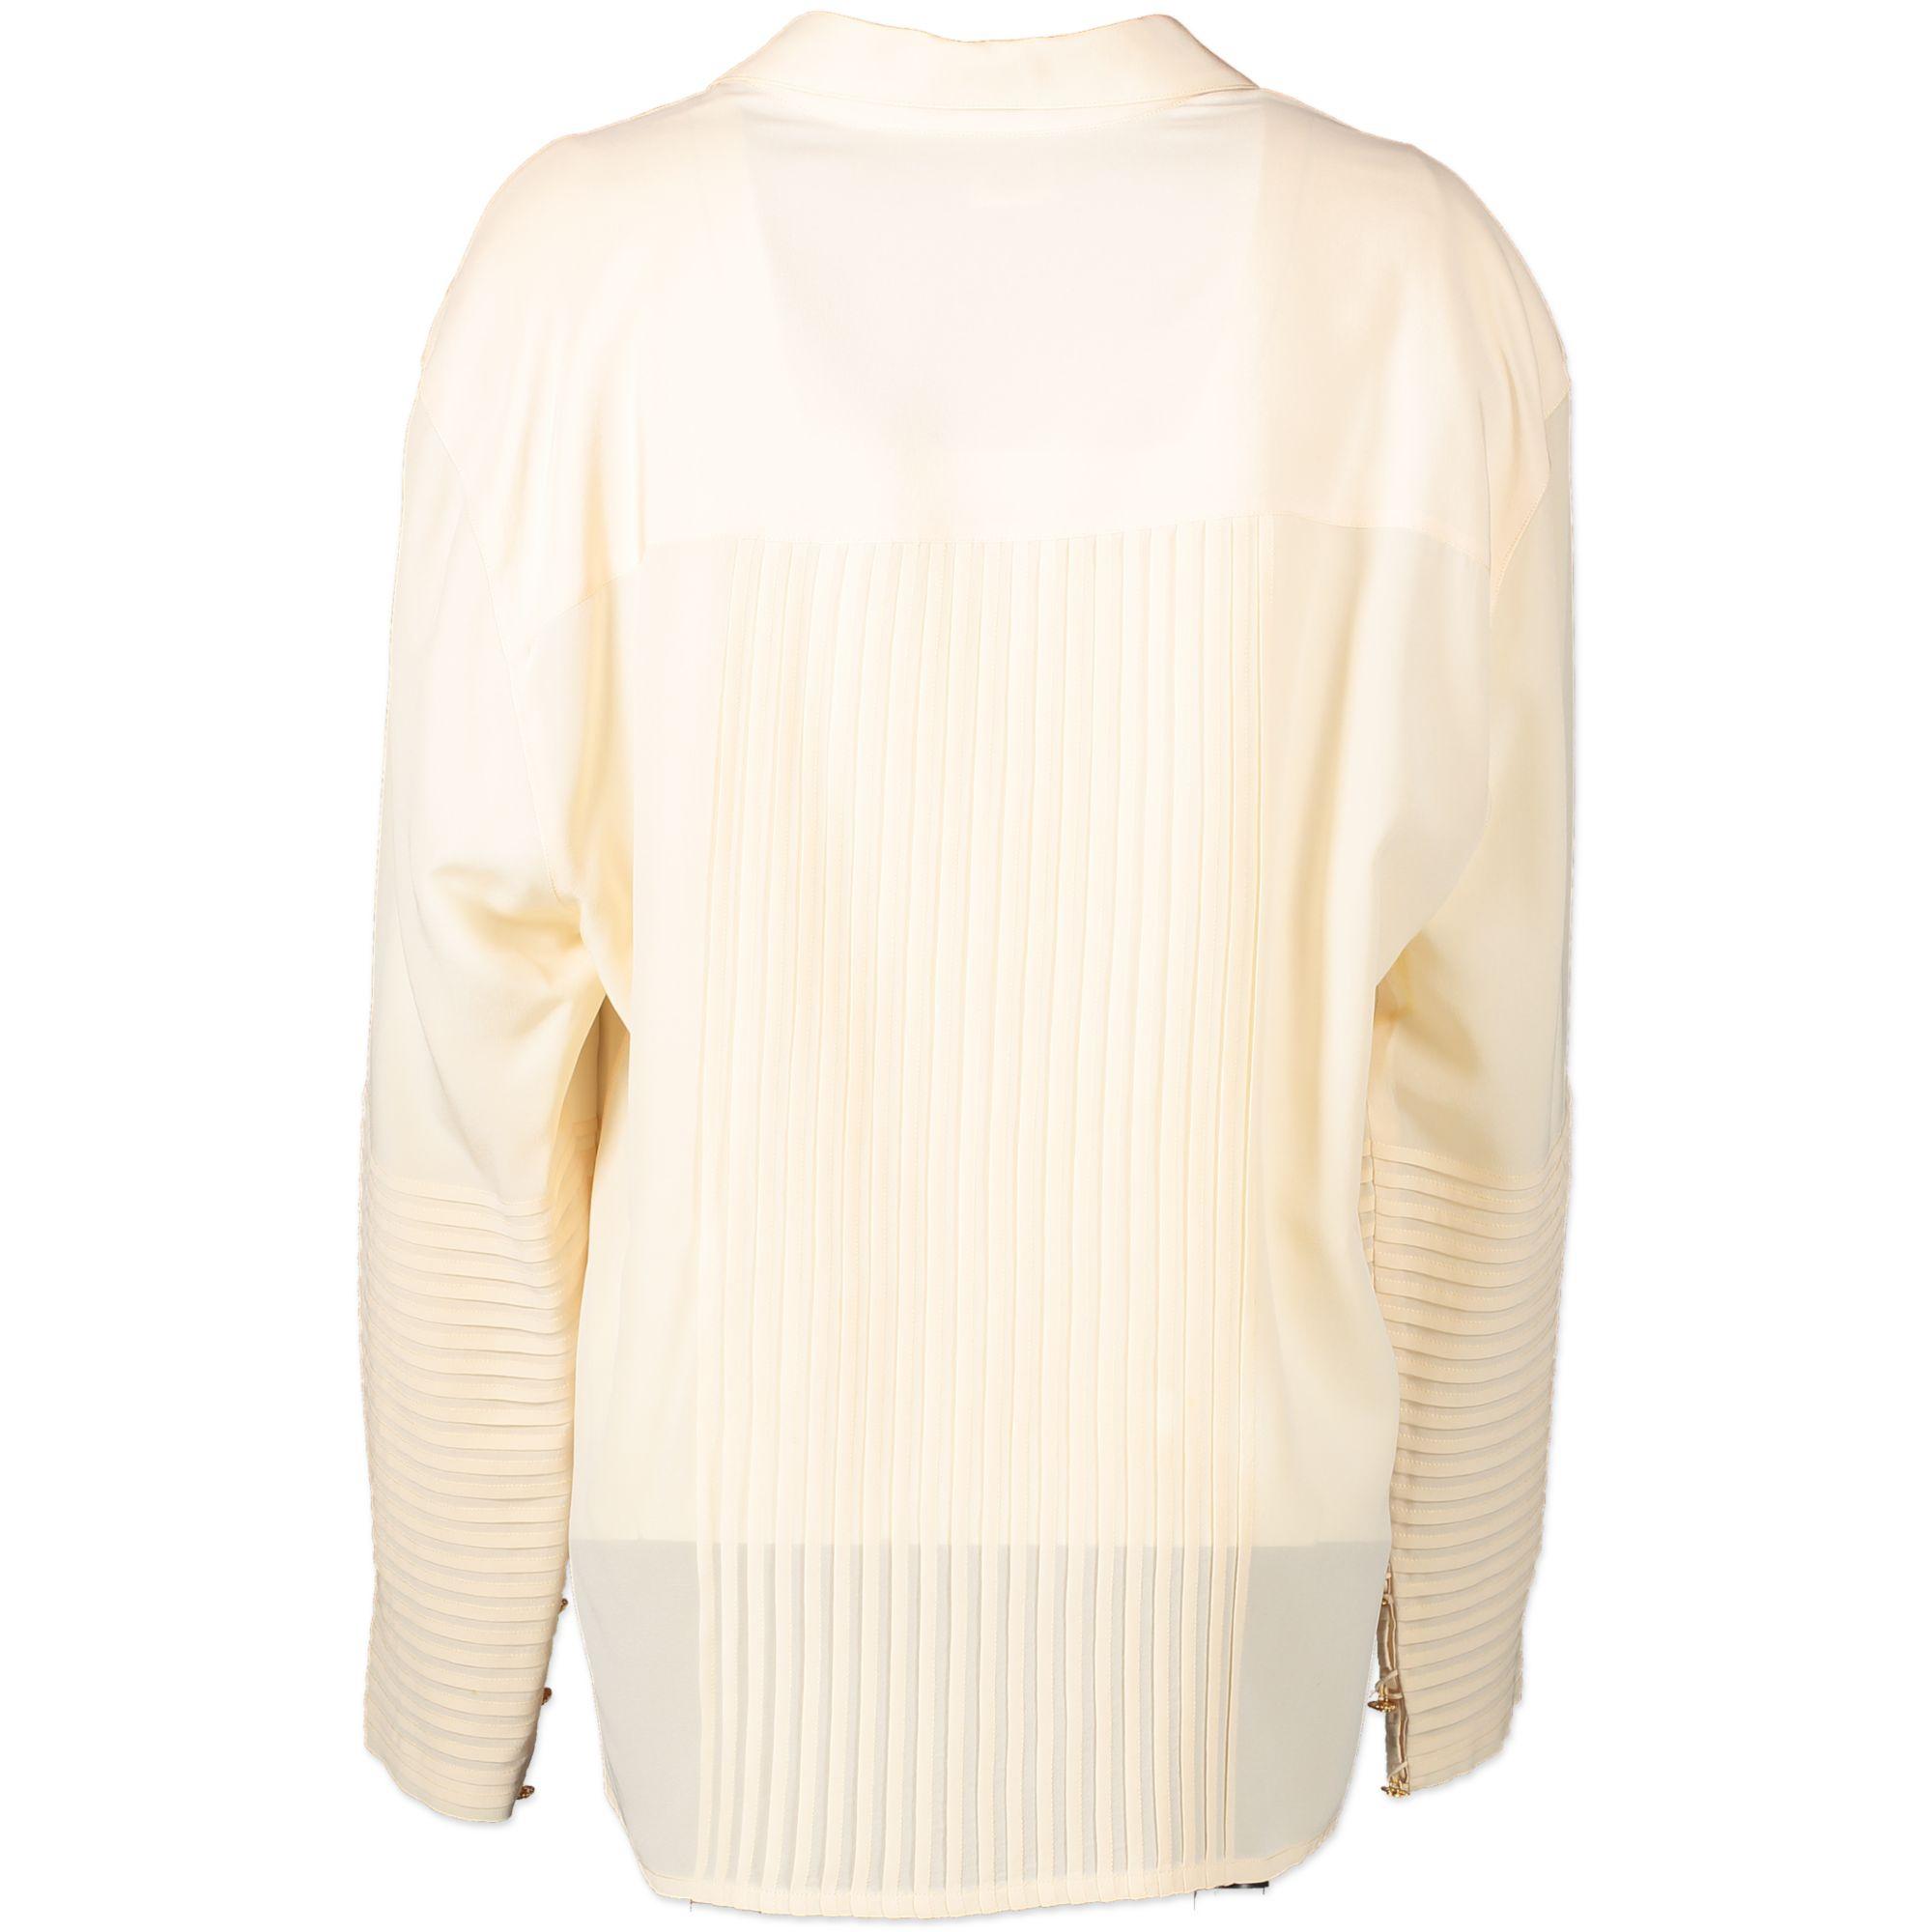 Chanel Silk Cream Blouse